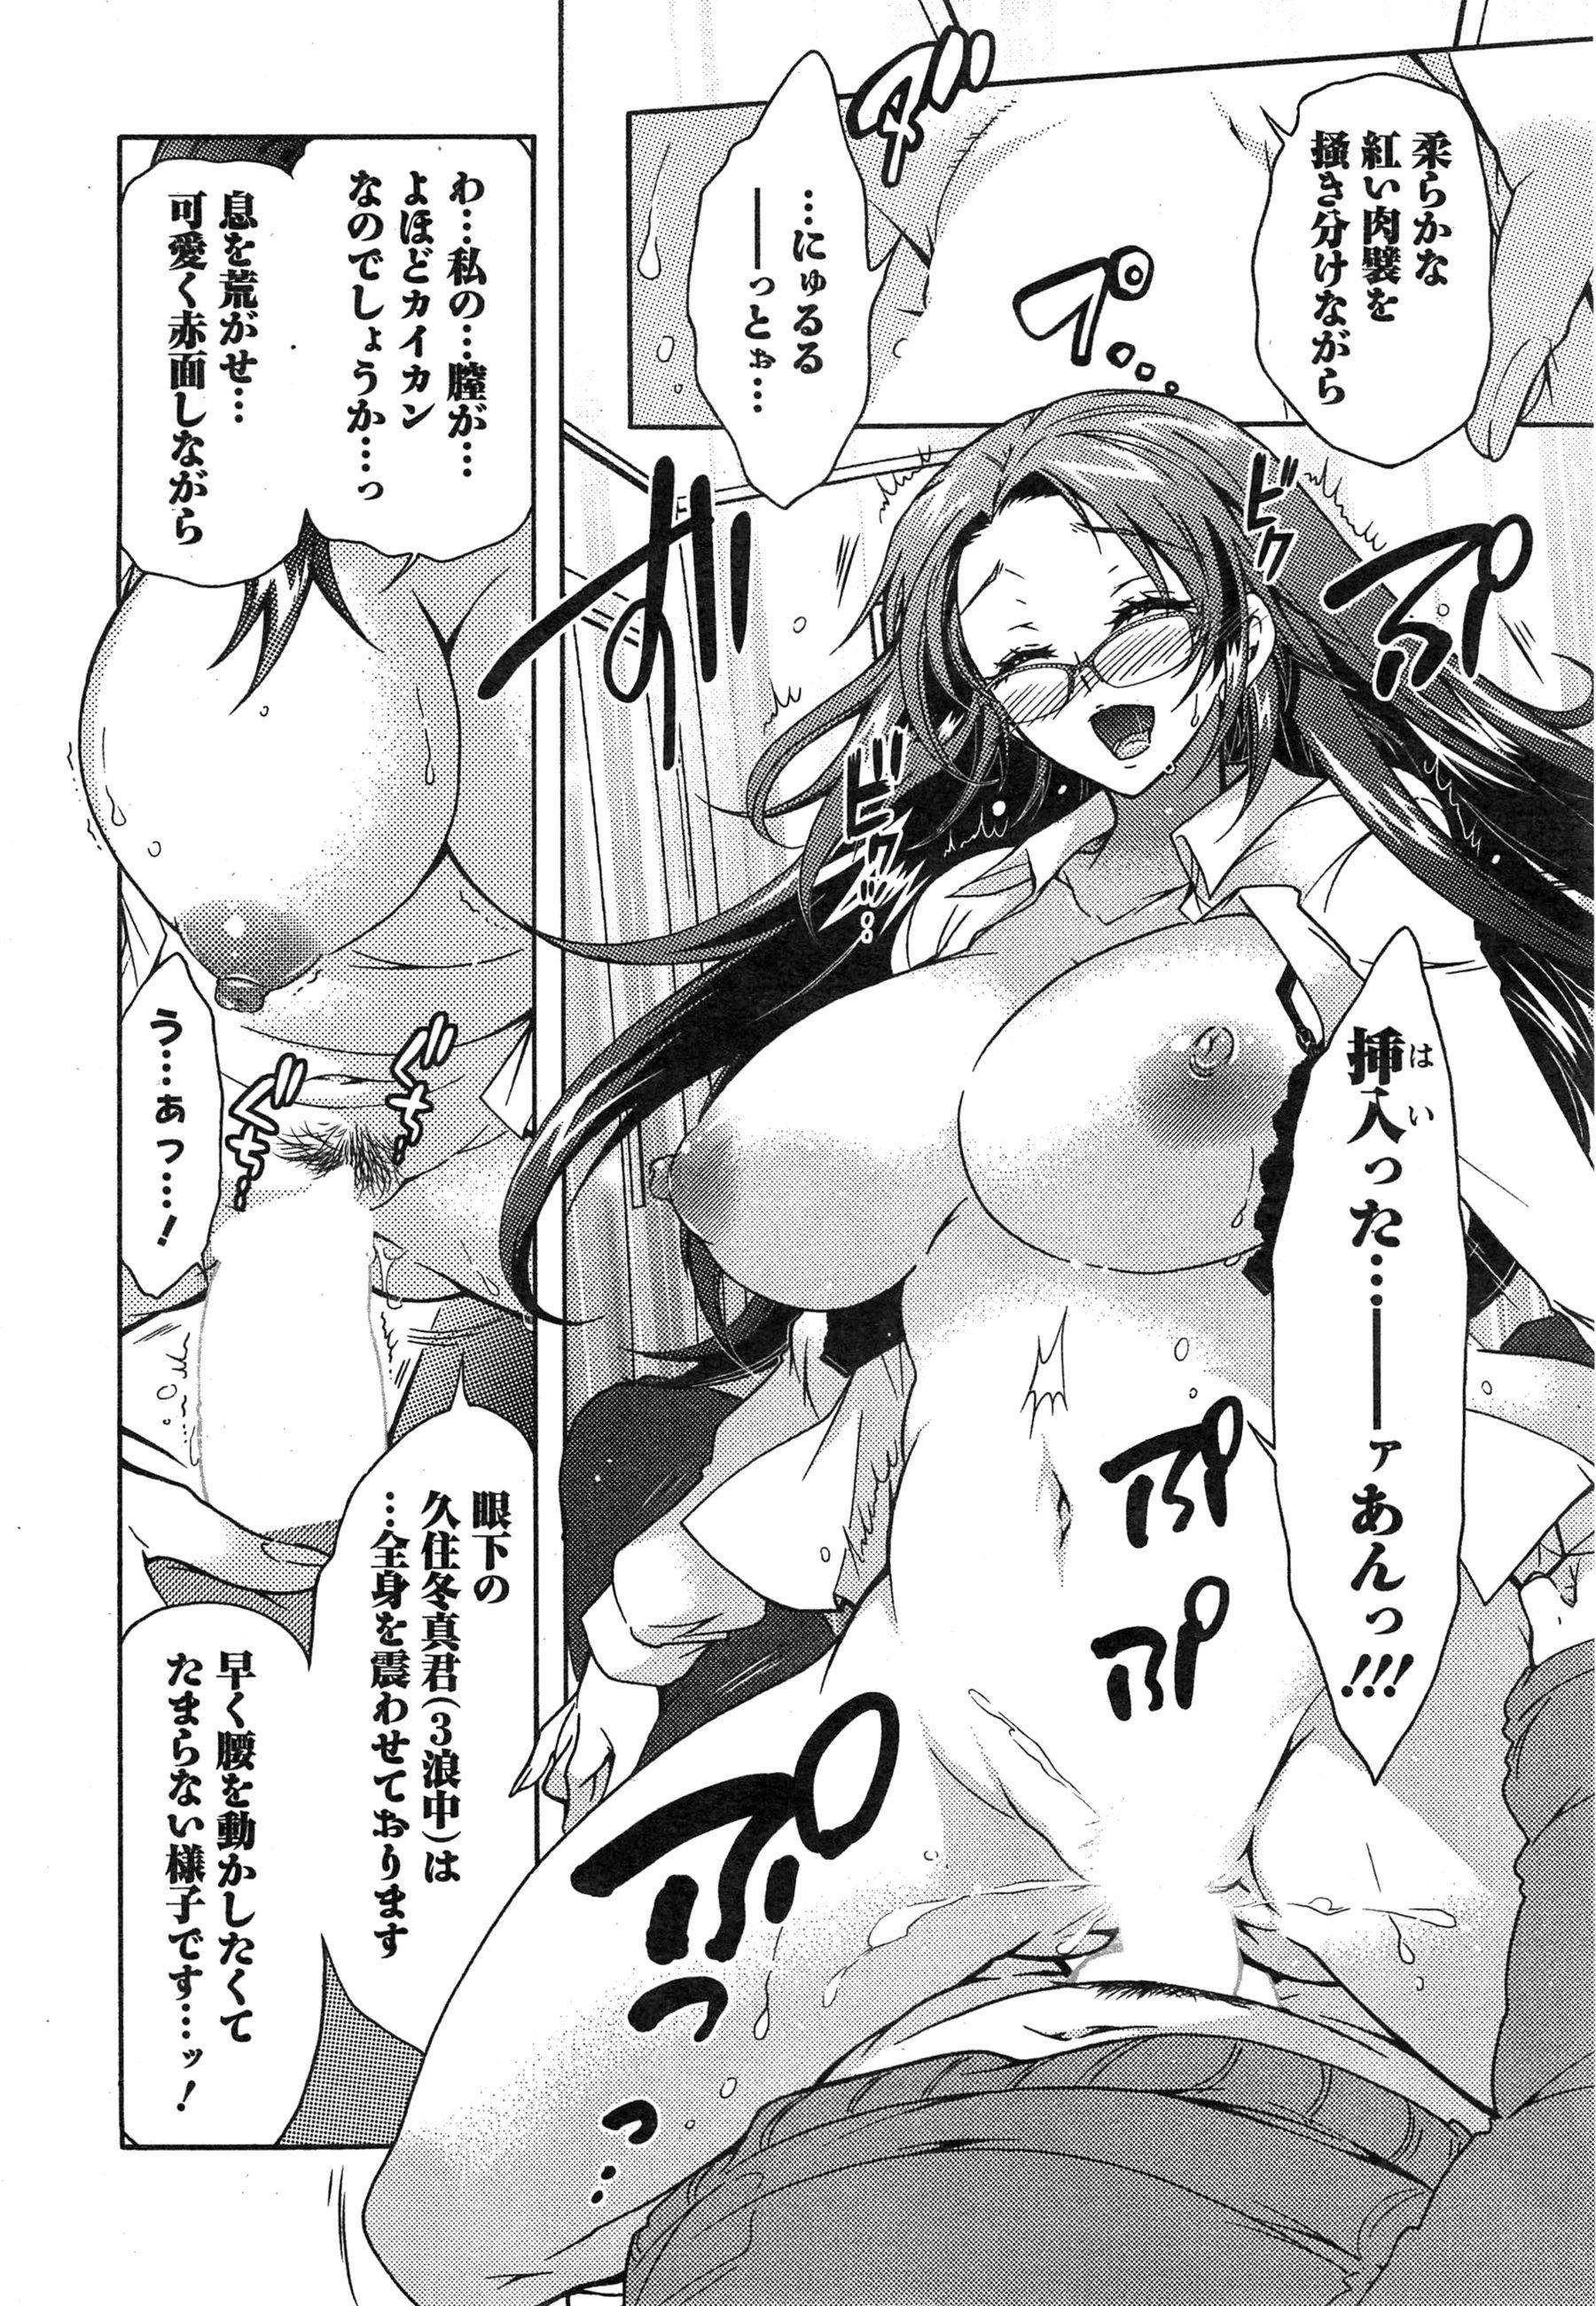 [Honda Arima] Sanshimai no Omocha - The Slave of Three Sisters Ch. 1-6 34